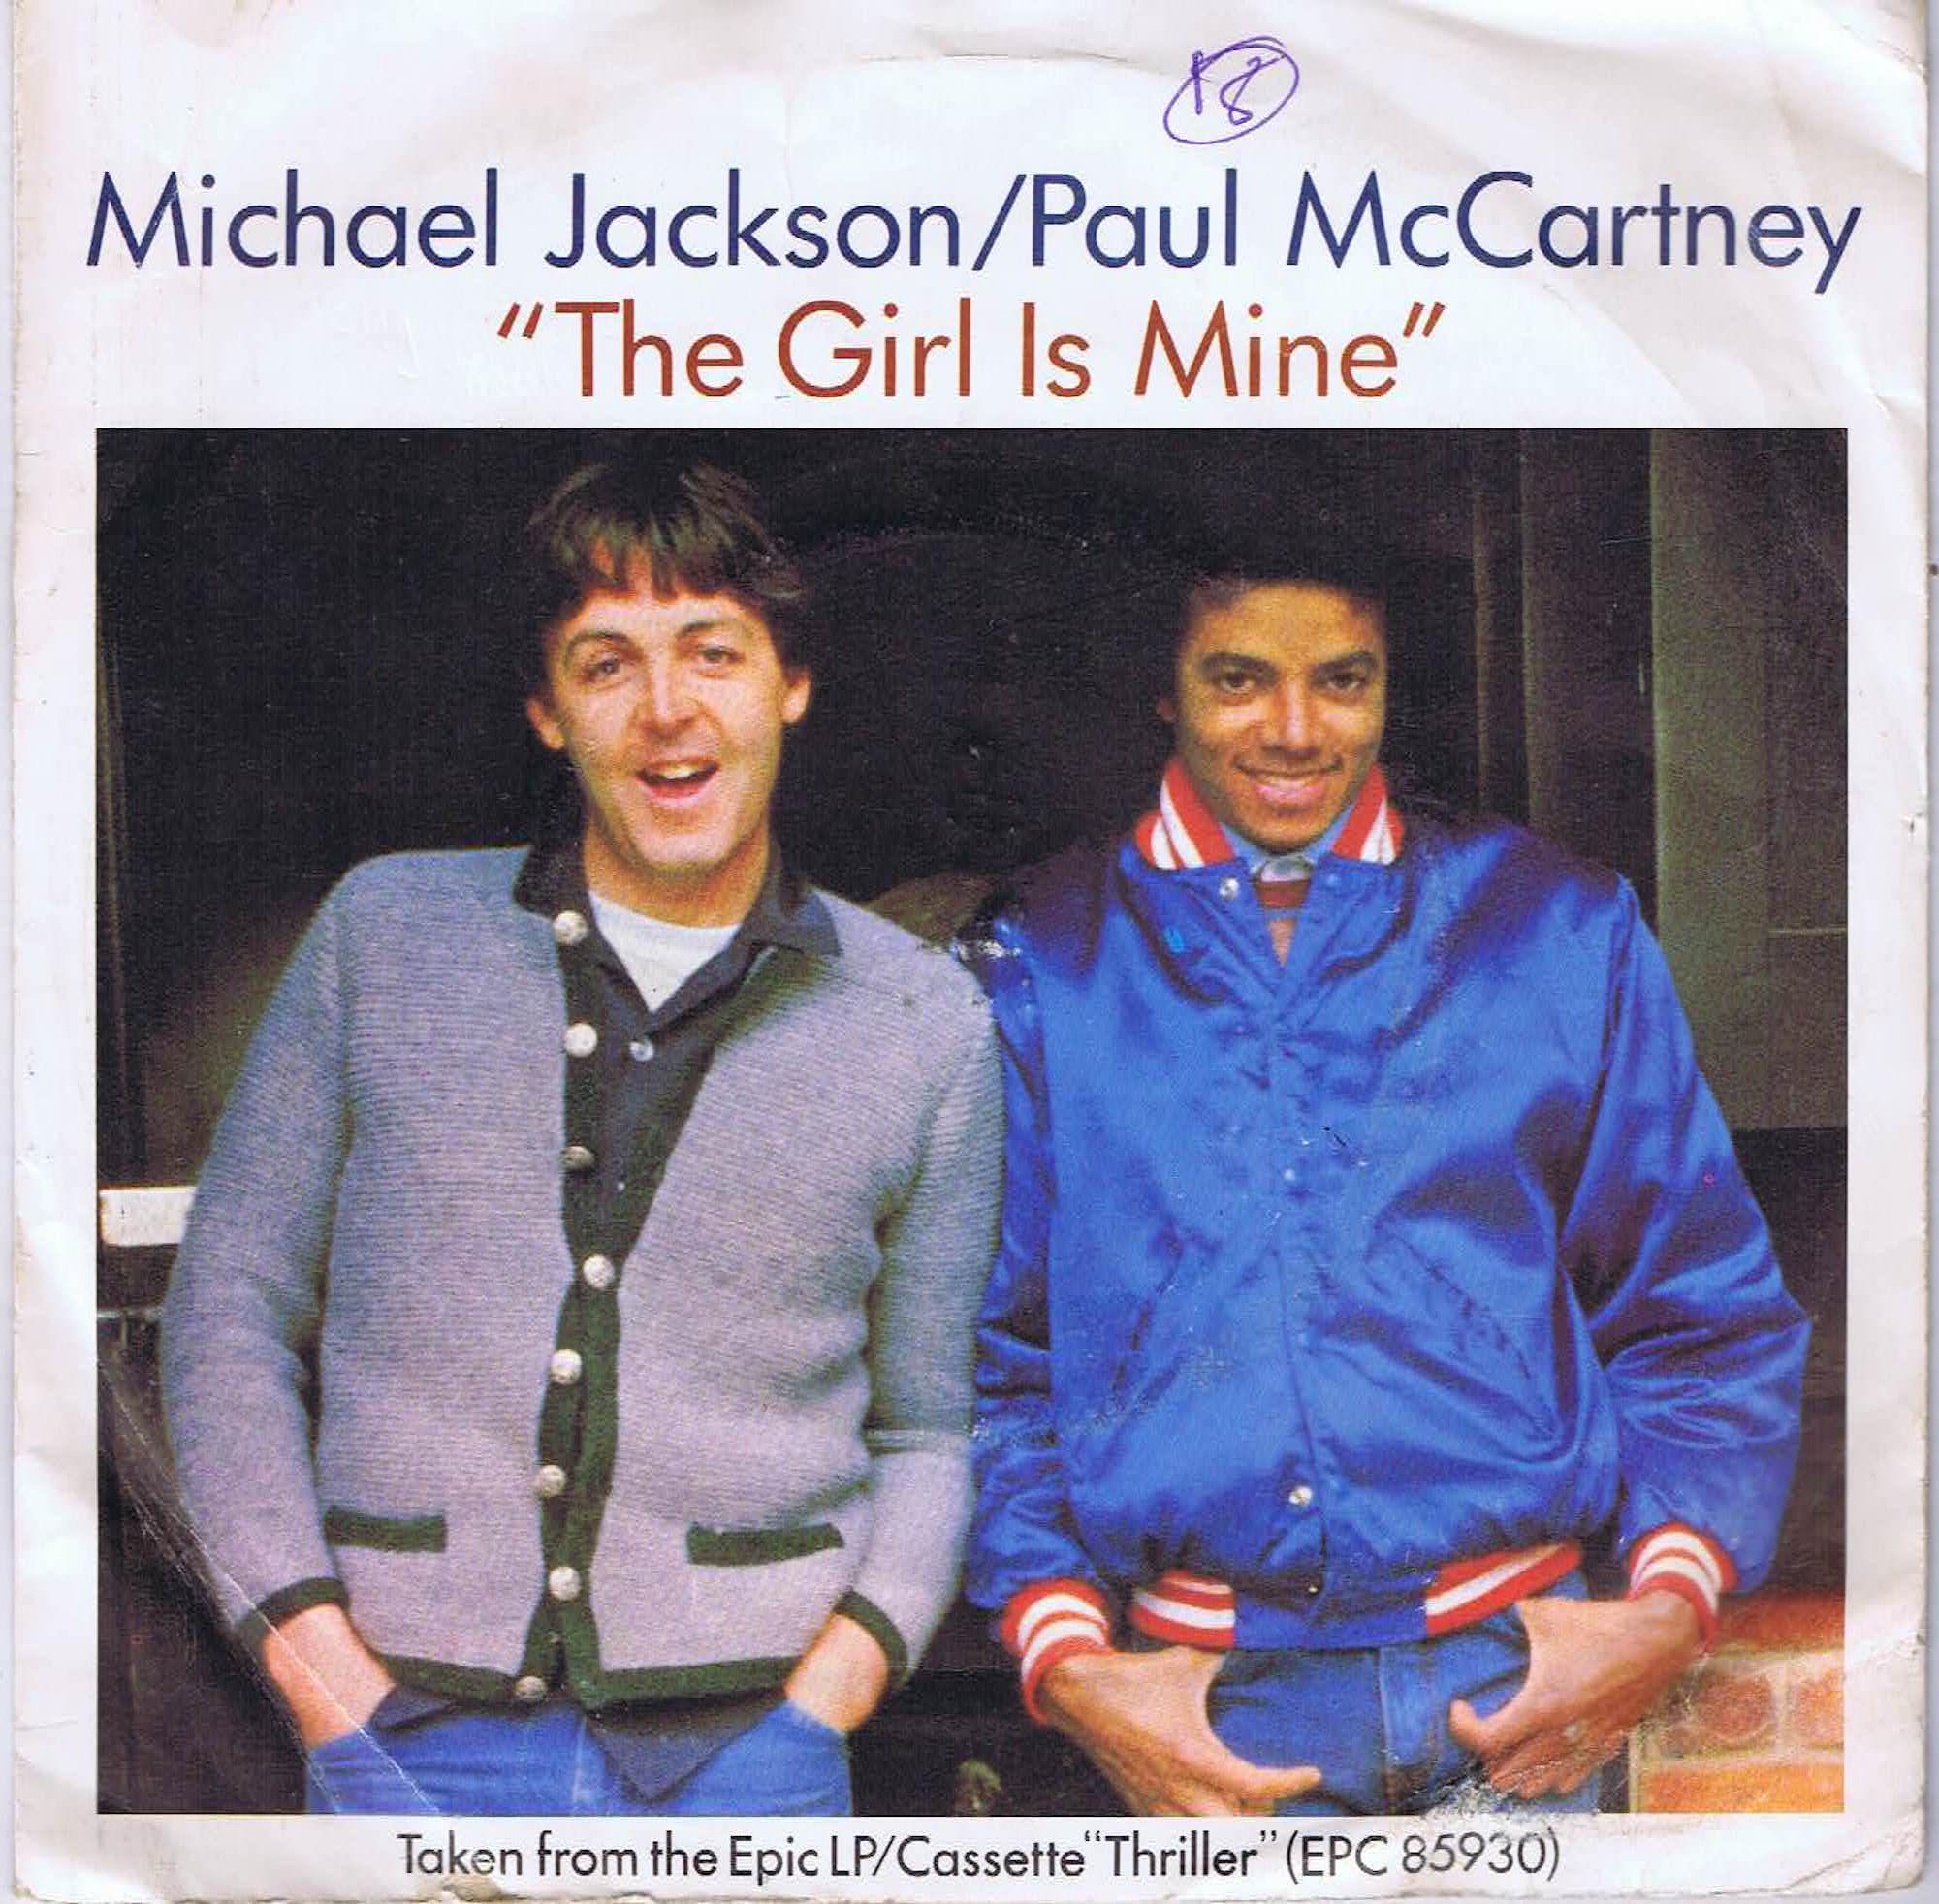 Michael Jackson Amp Paul Mccartney The Girl Is Mine 7